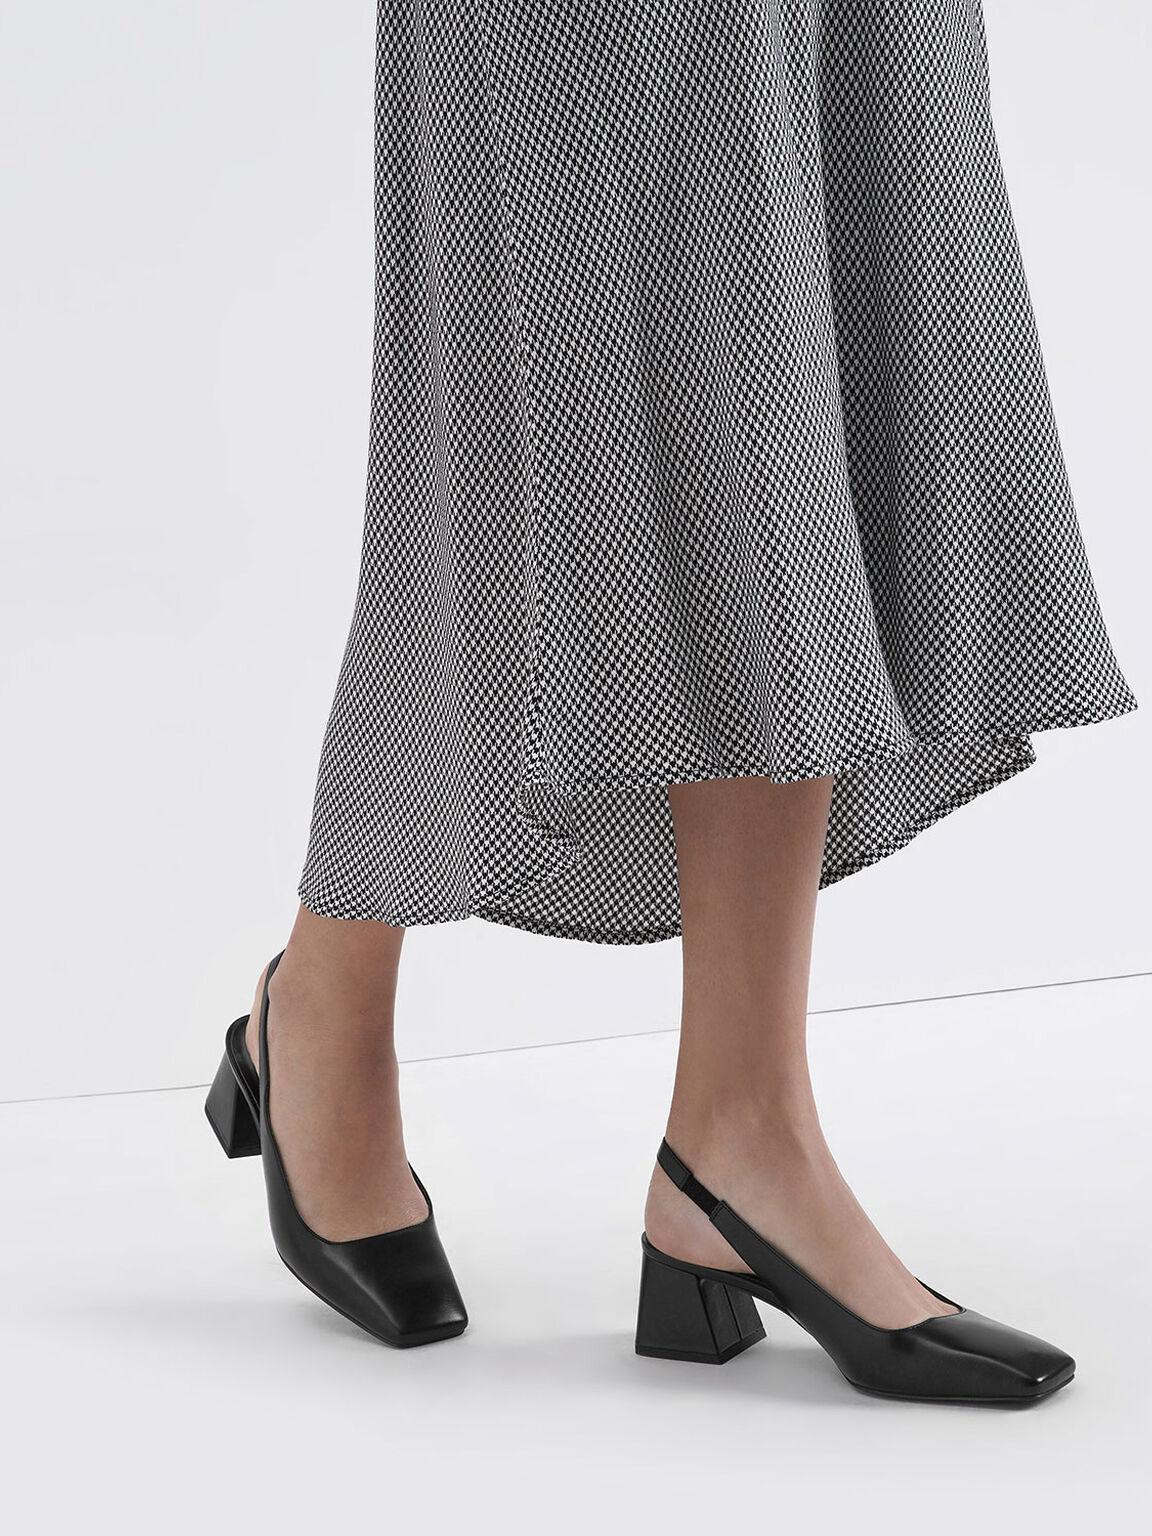 Square Toe Slingback Heels, Black, hi-res